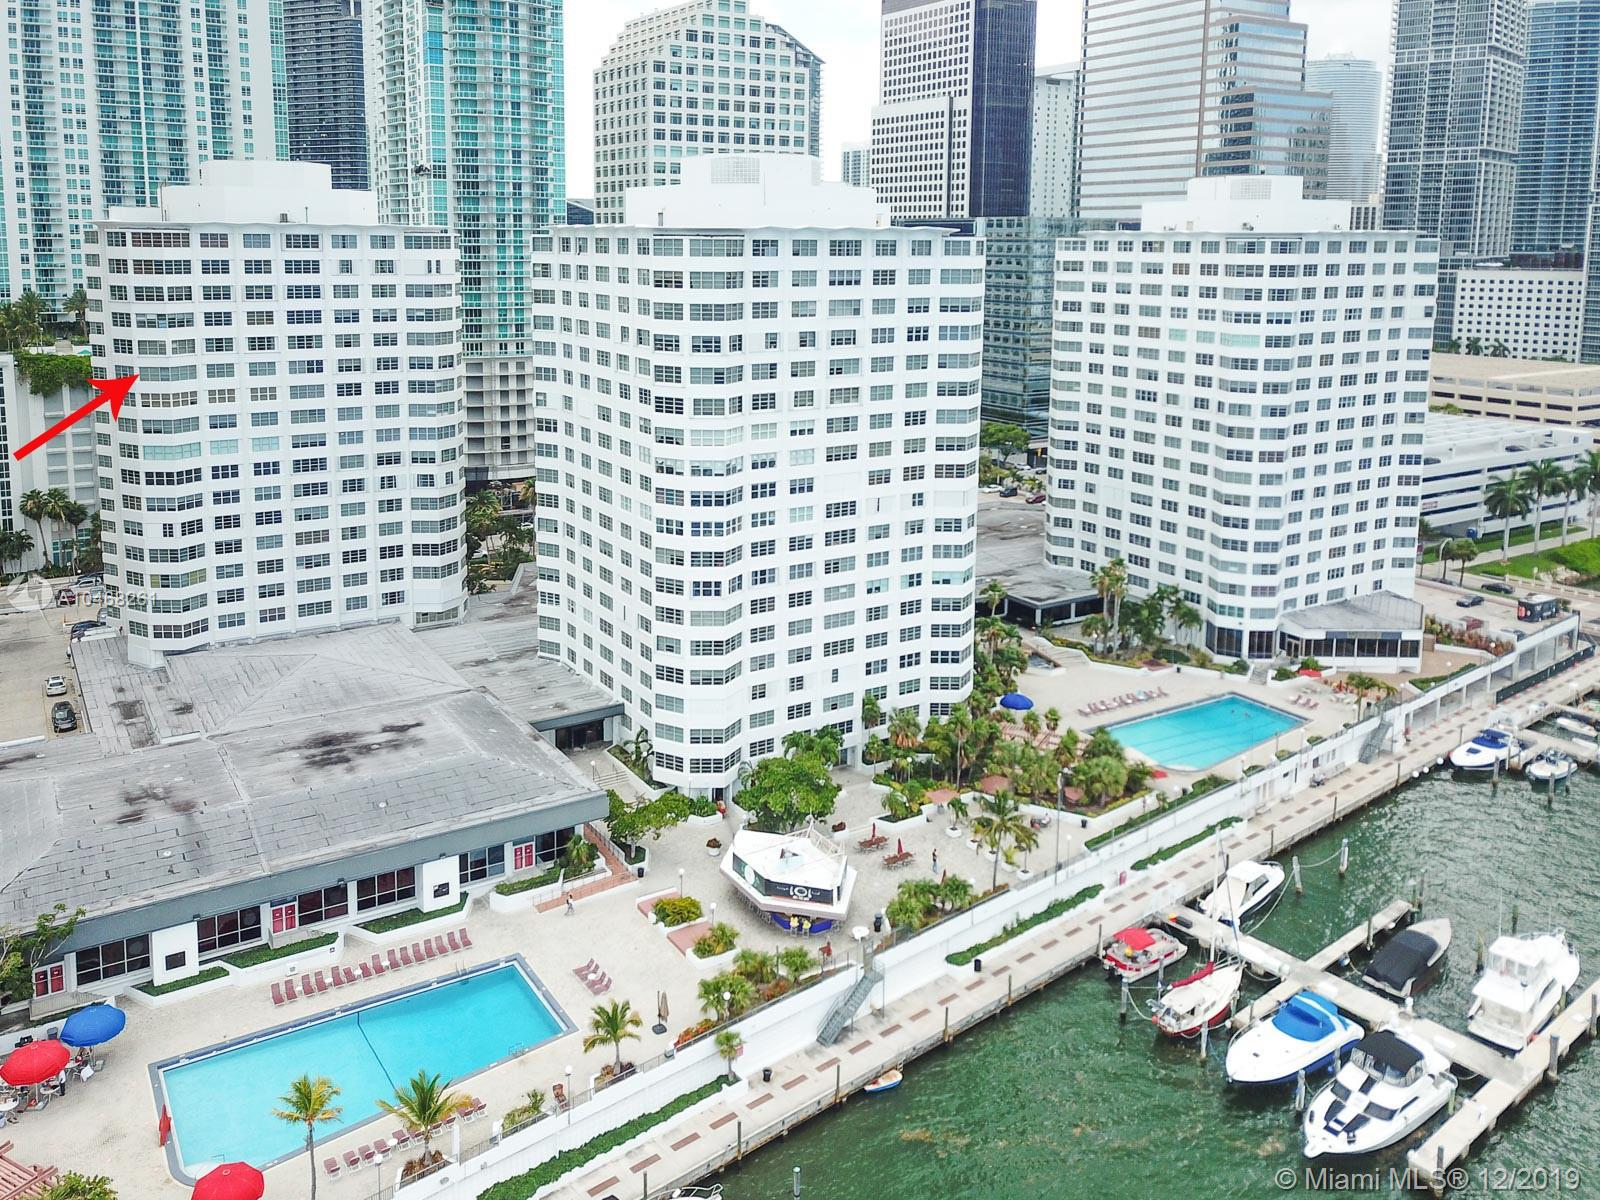 999 Brickell Bay Dr, Miami FL, 33131